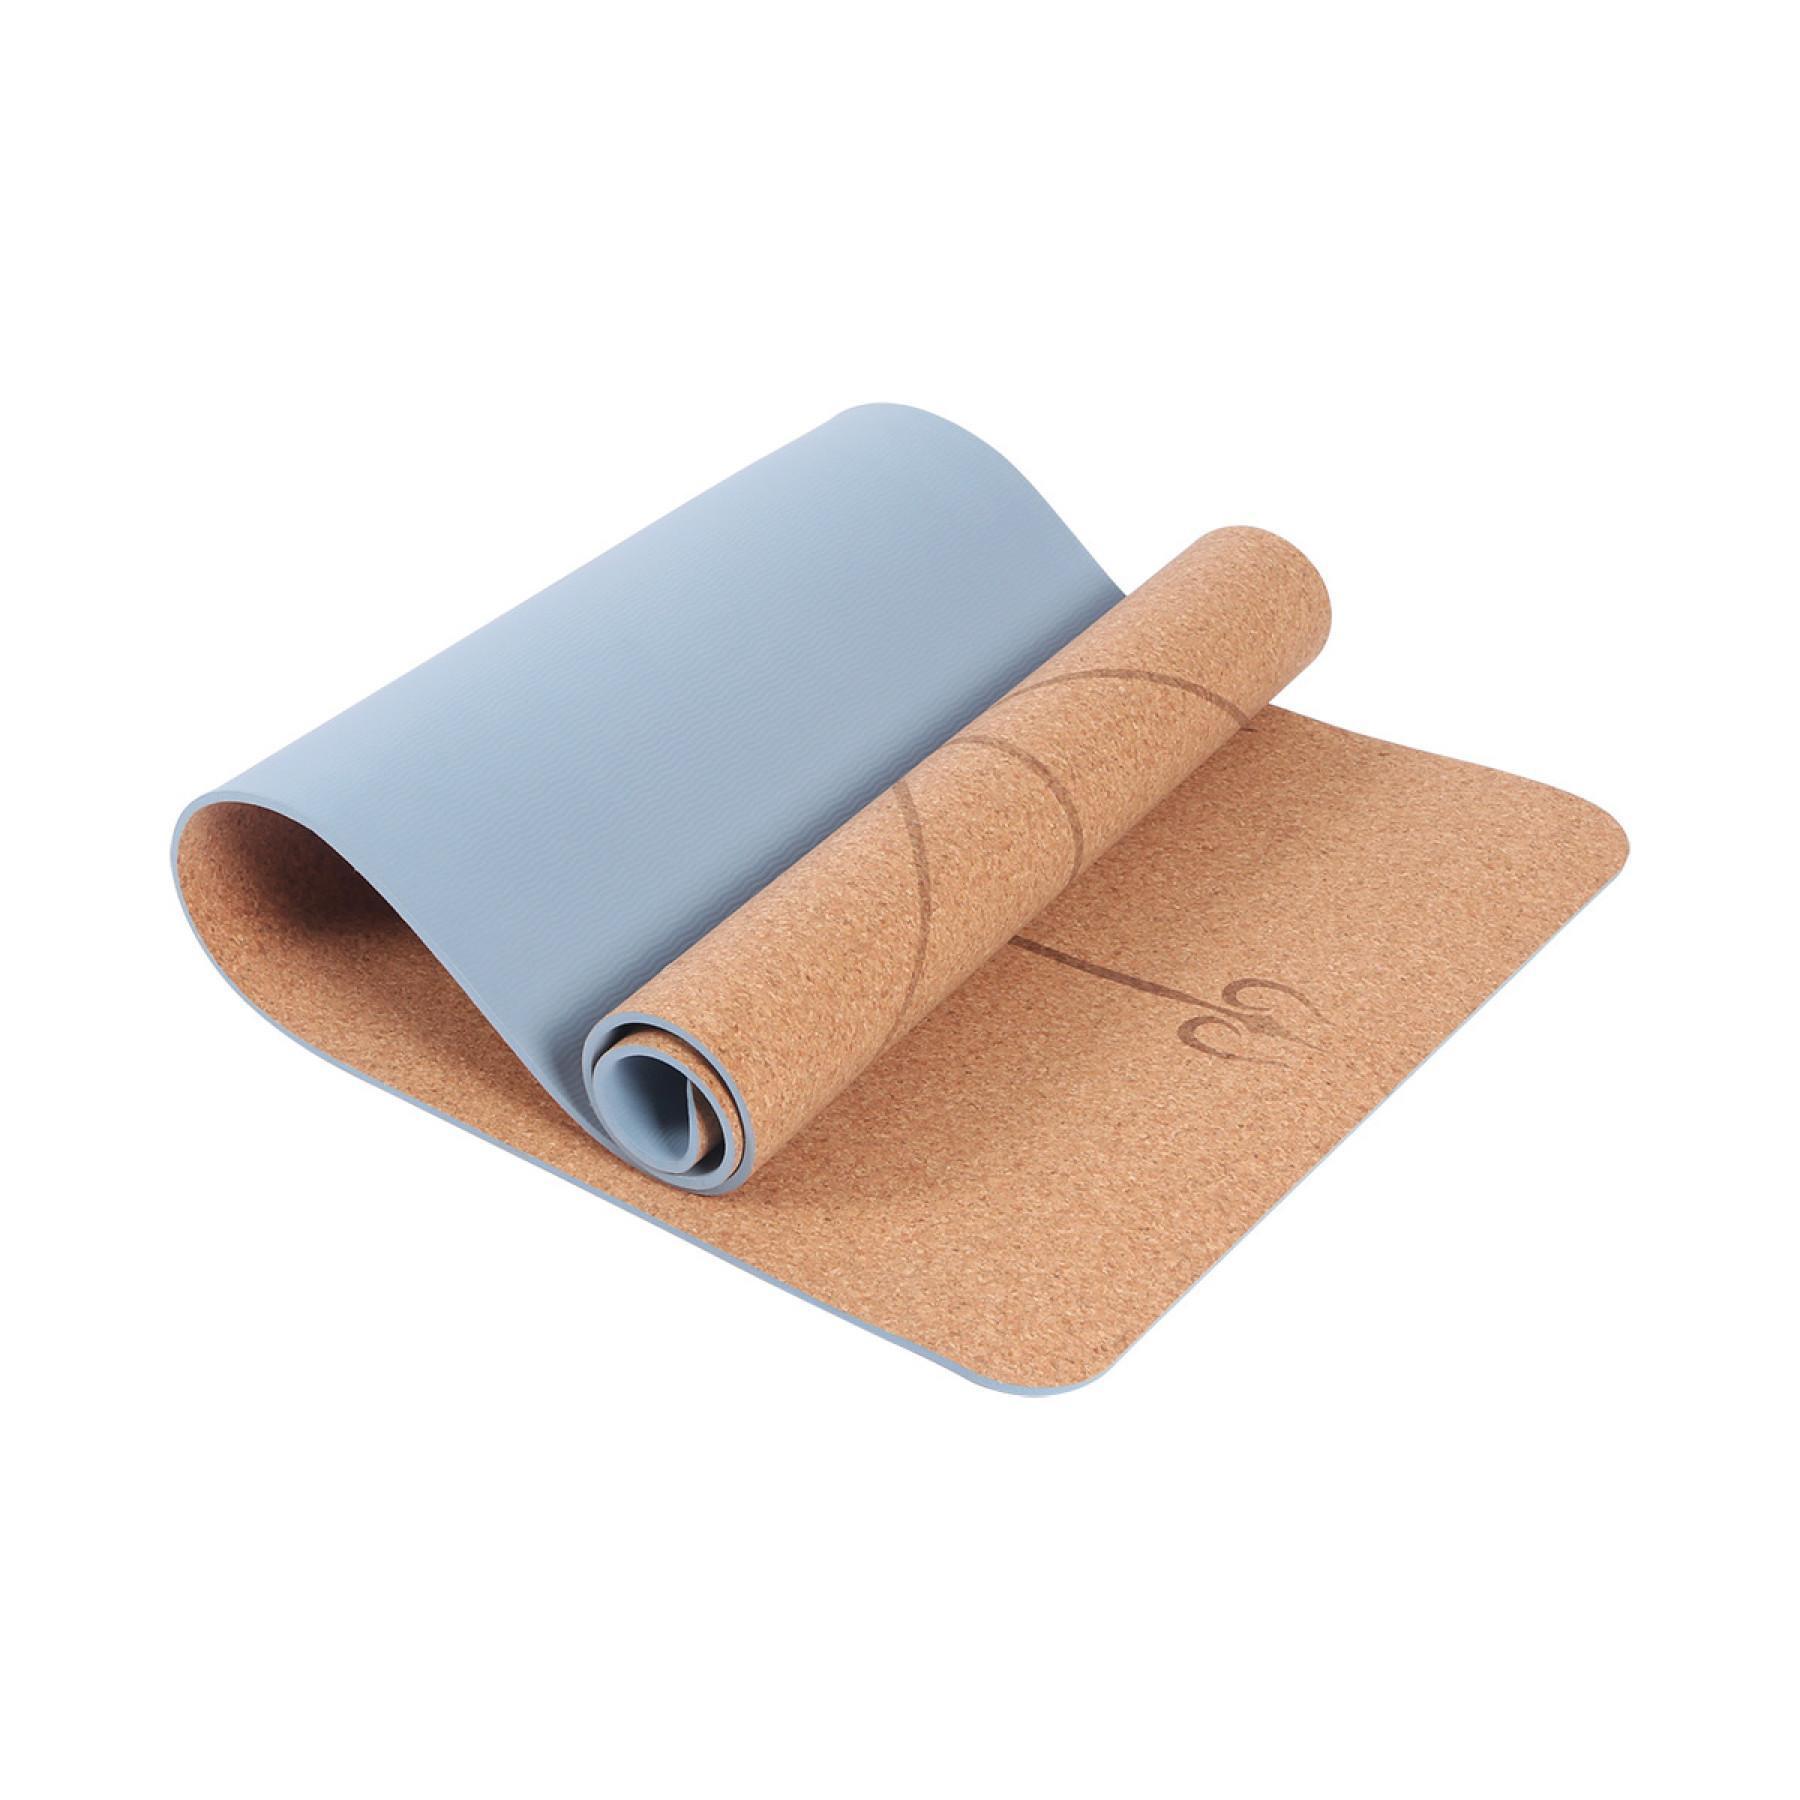 Yoga mat made of cork Sporti France